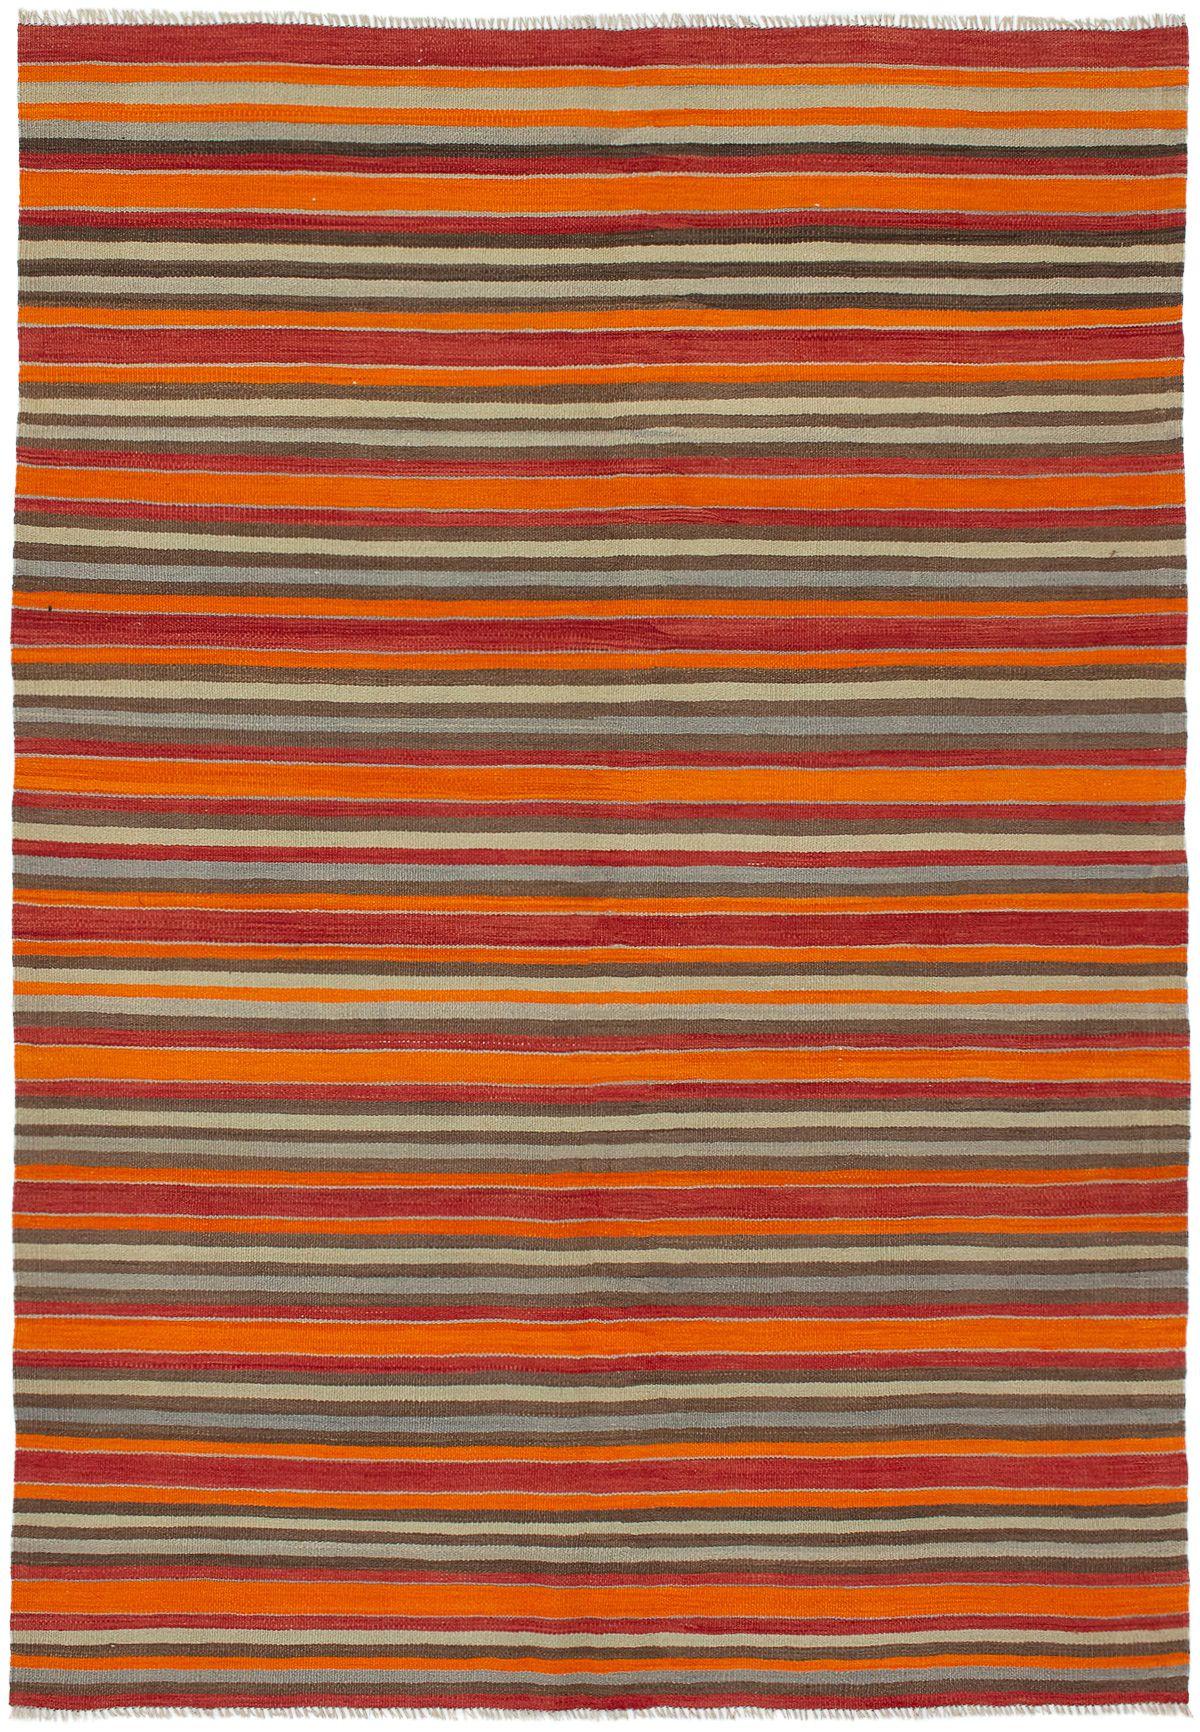 "Hand woven Bohemian Orange Wool Kilim 6'0"" x 8'7"" Size: 6'0"" x 8'7"""